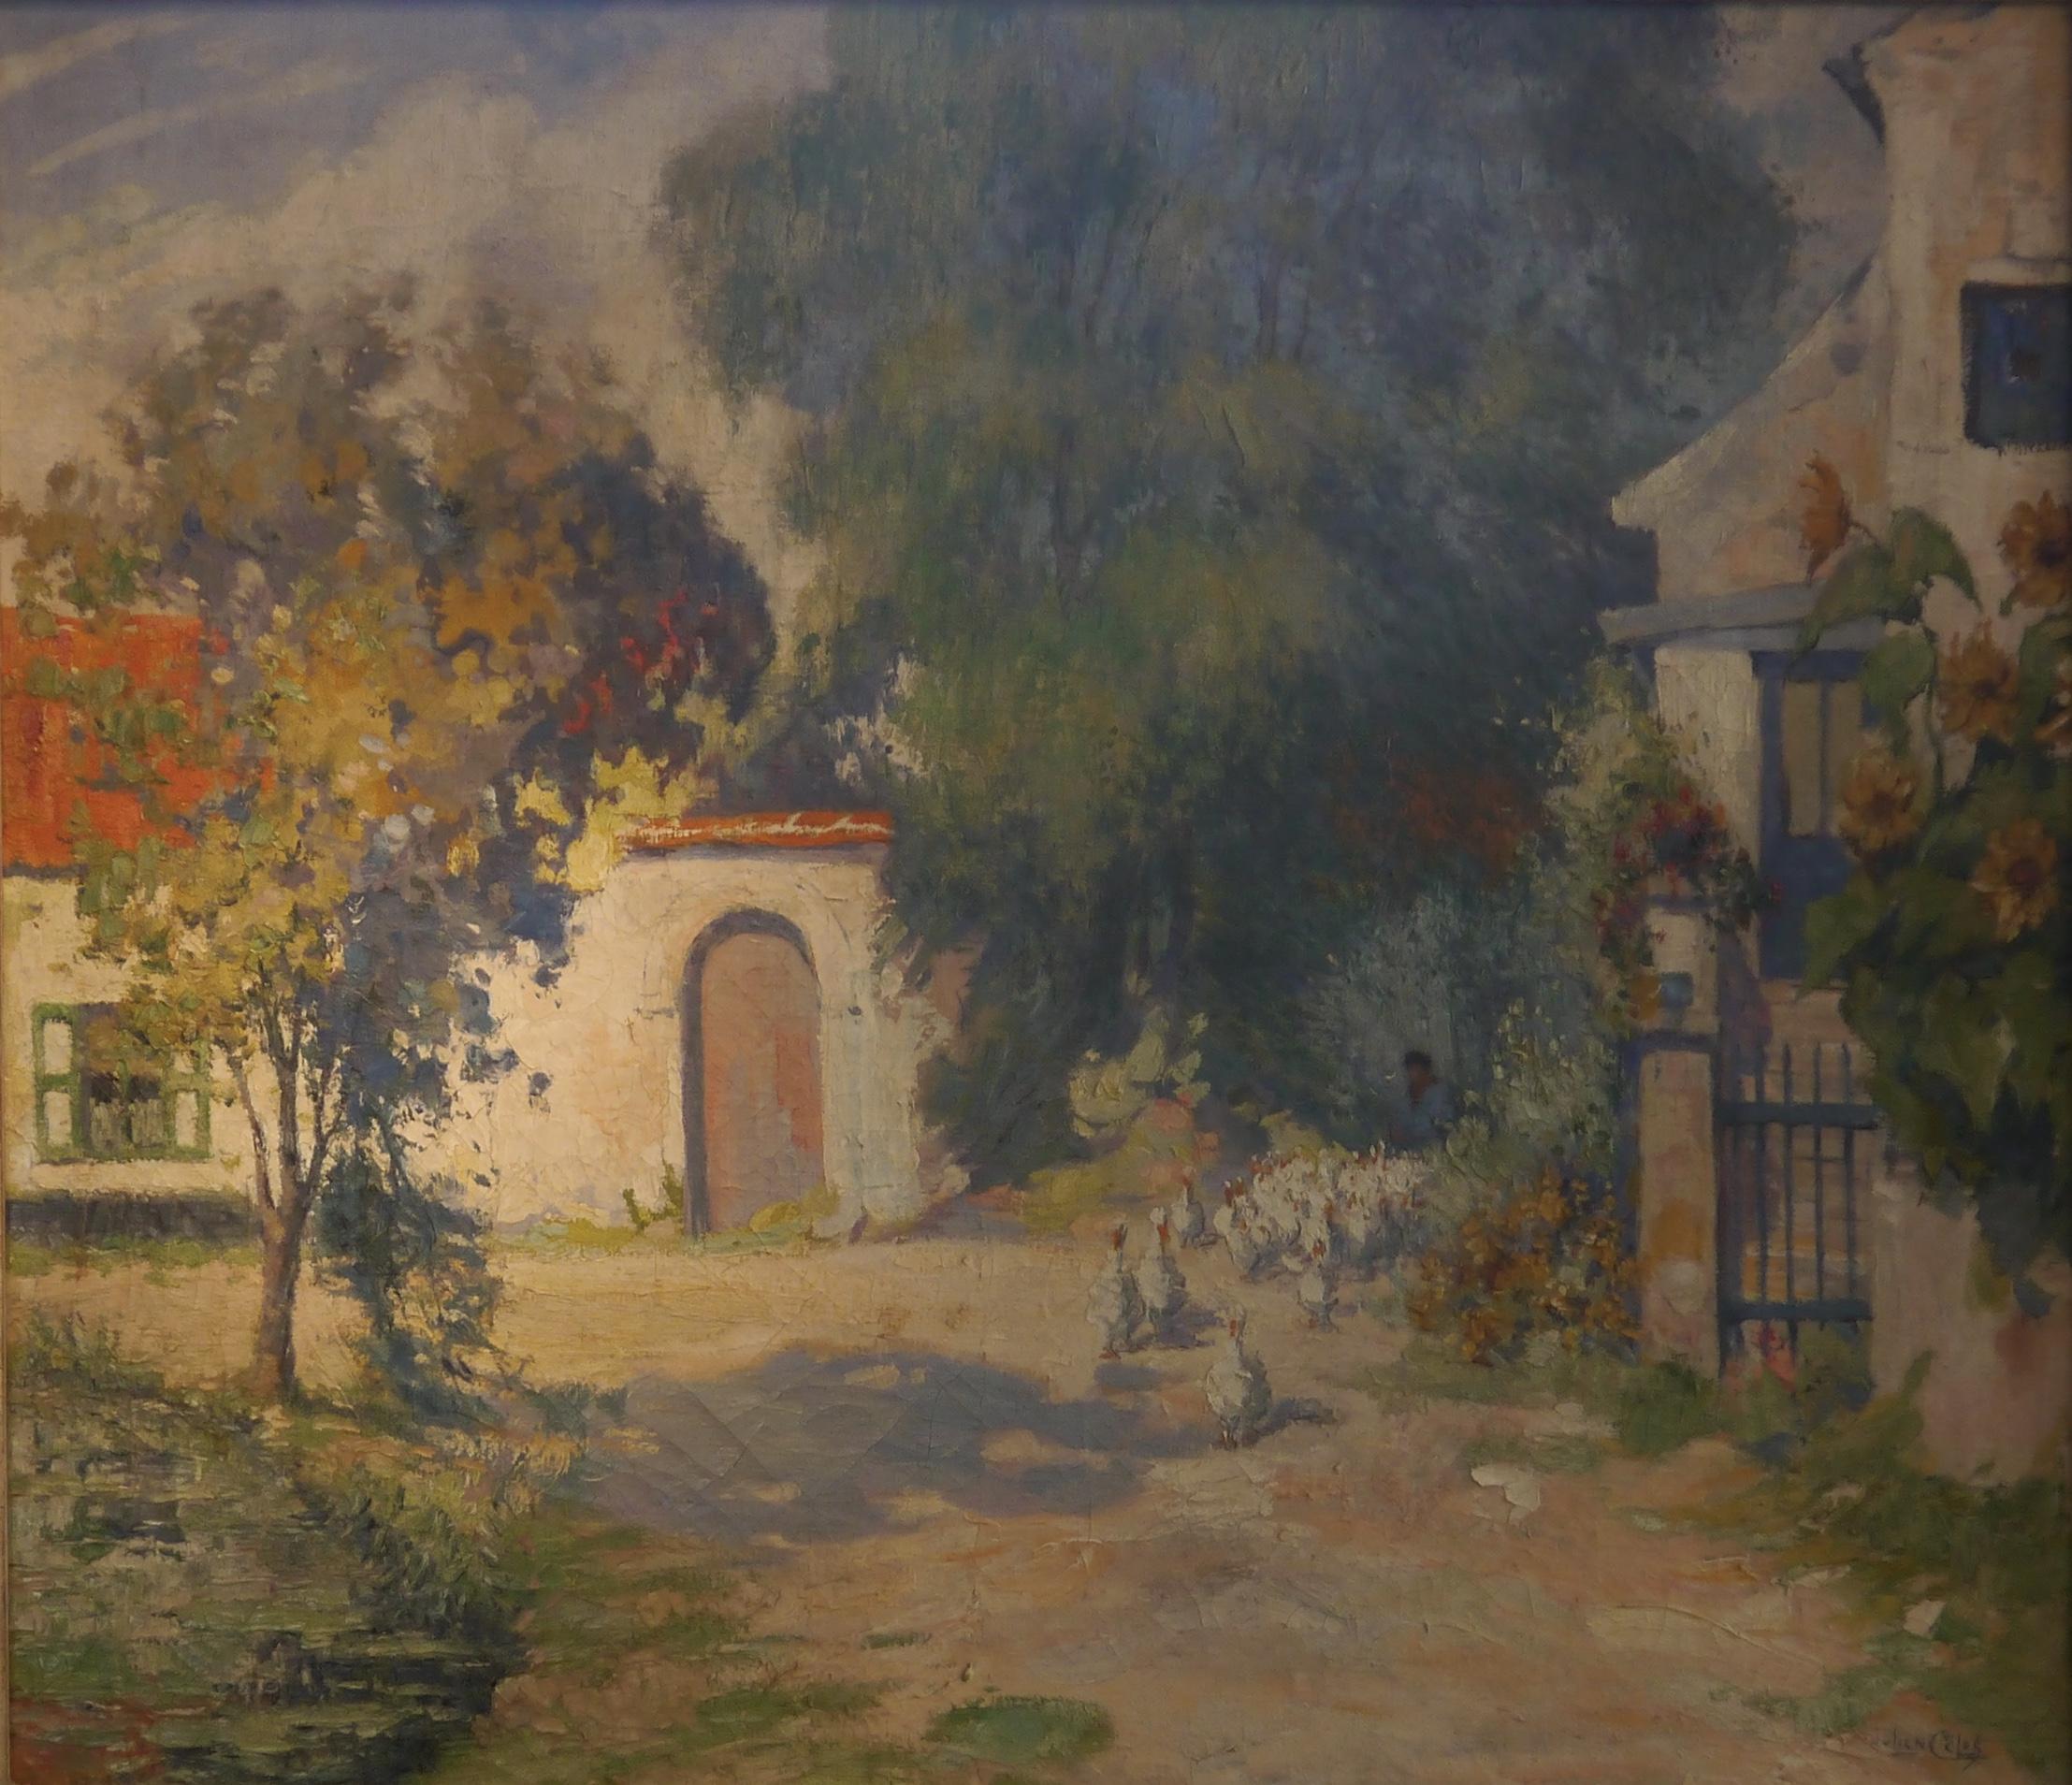 Julien Celos – La ferme